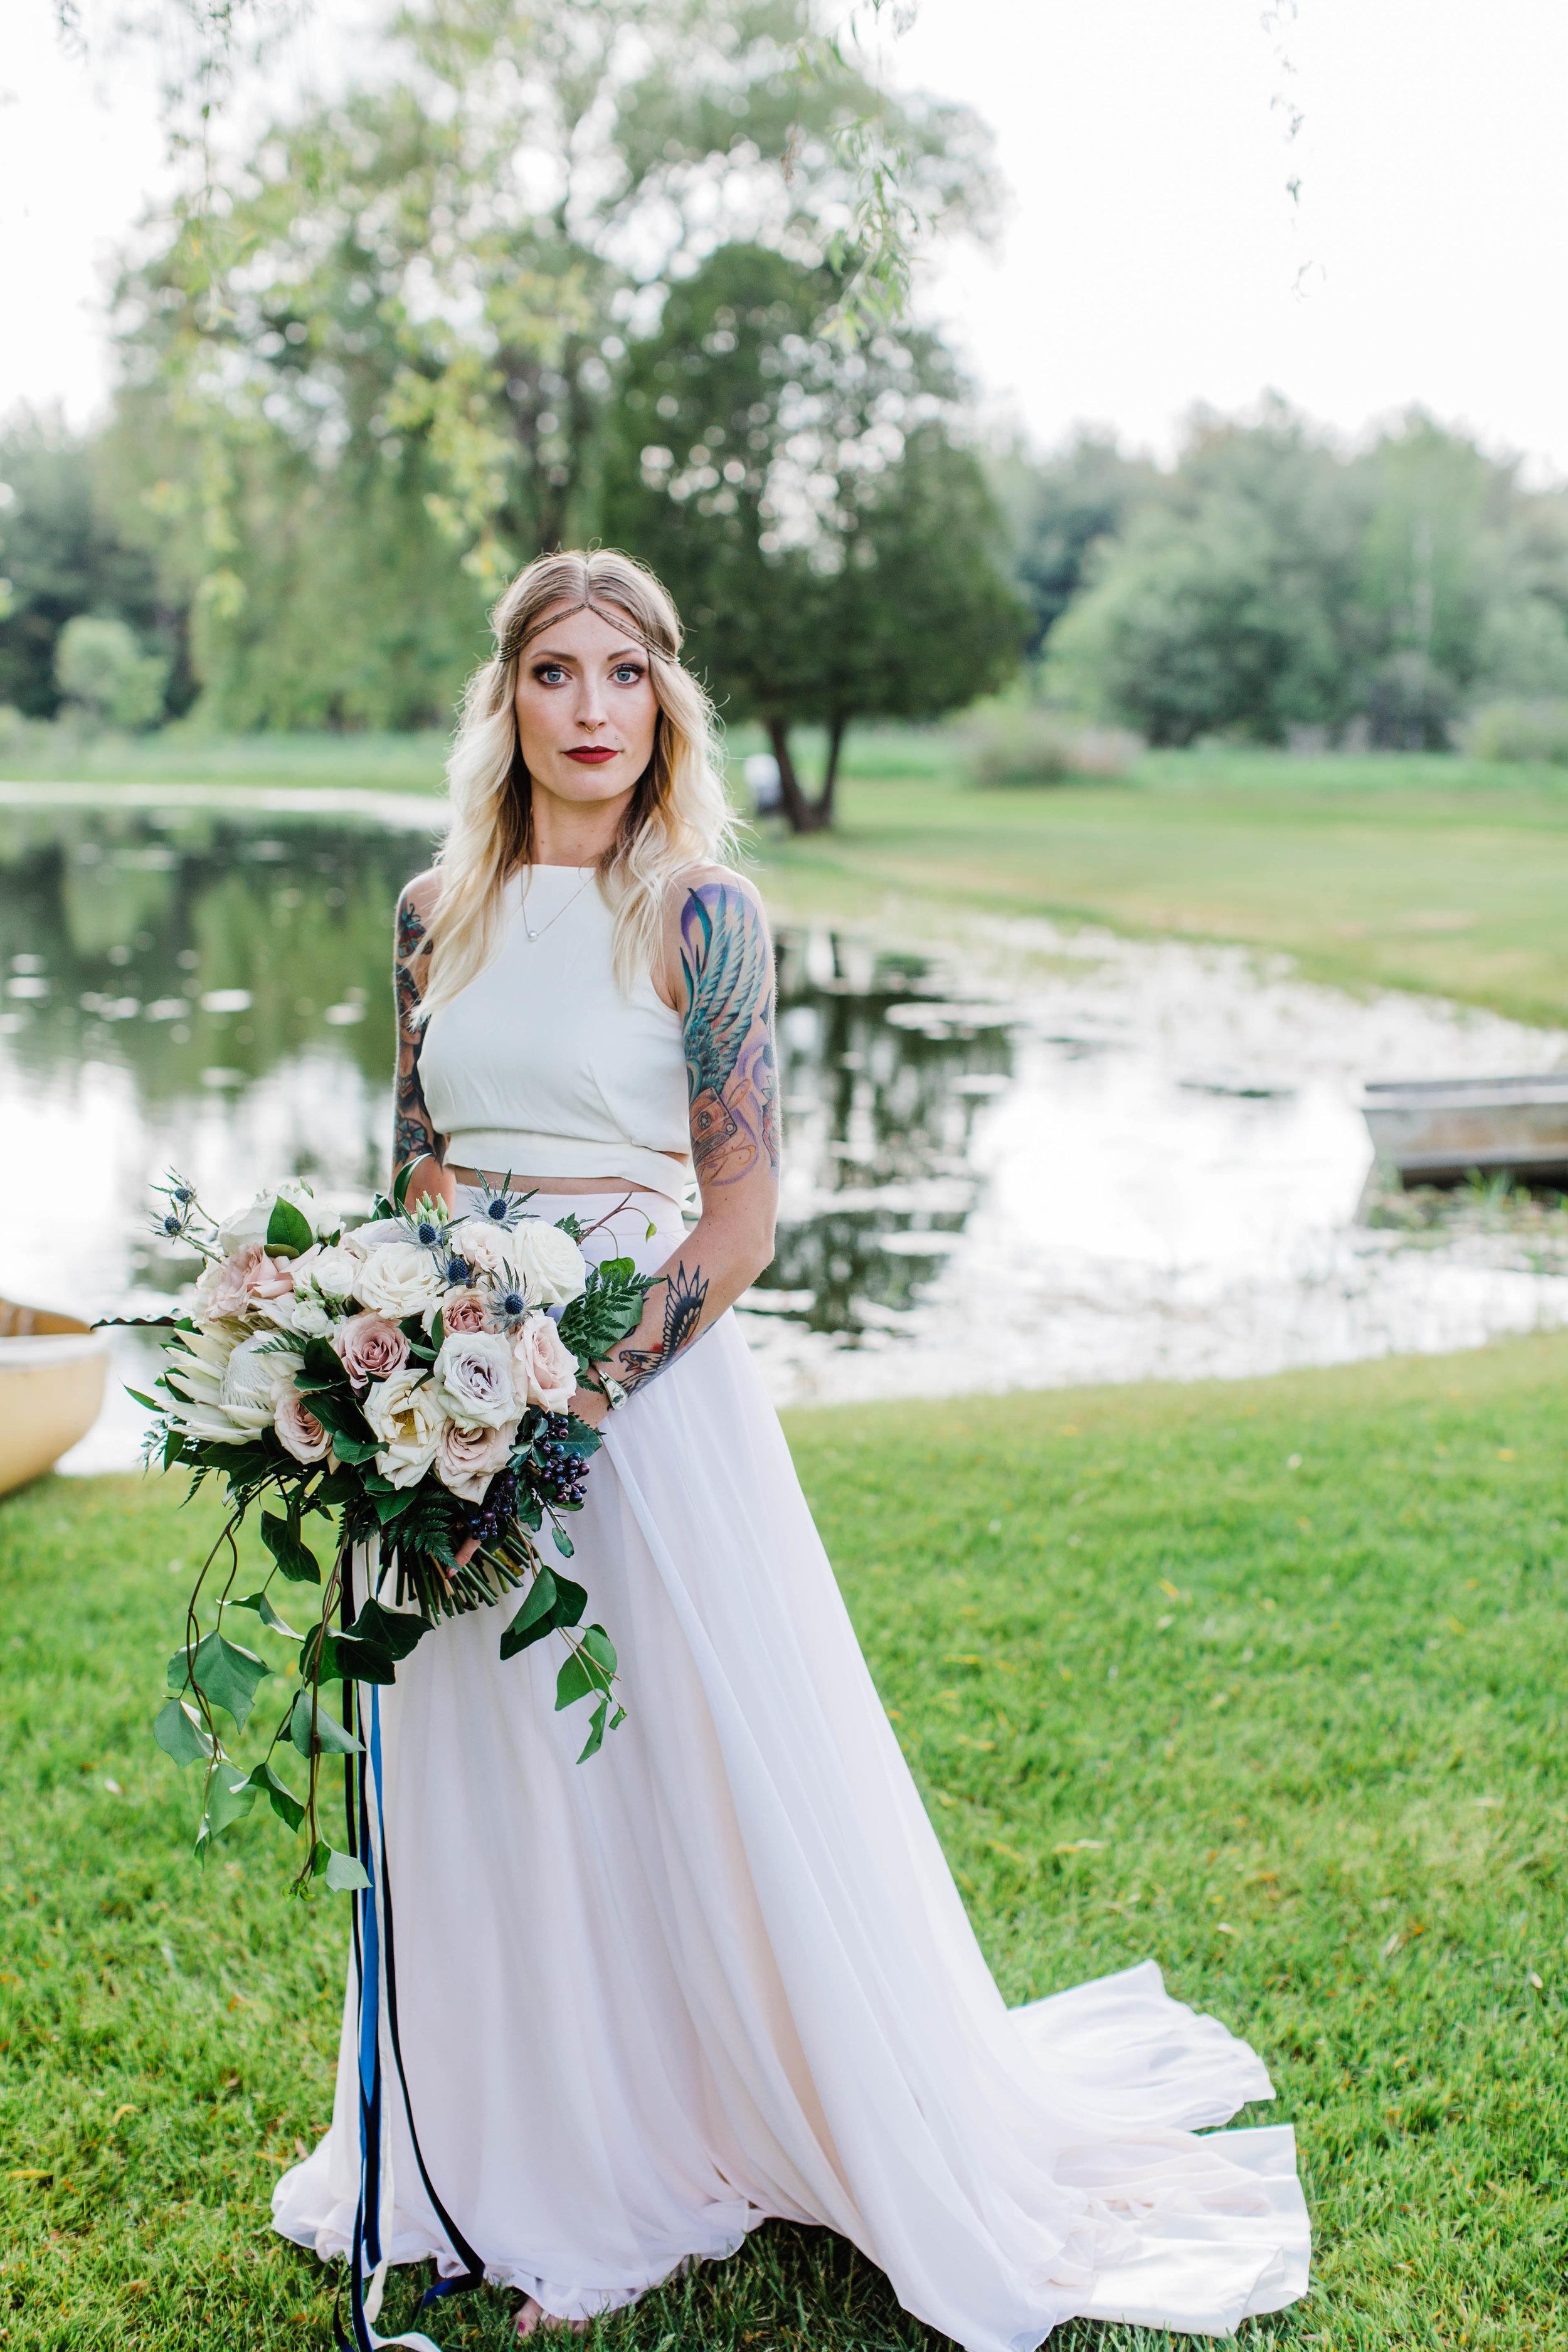 Amanda steinhauer Photography